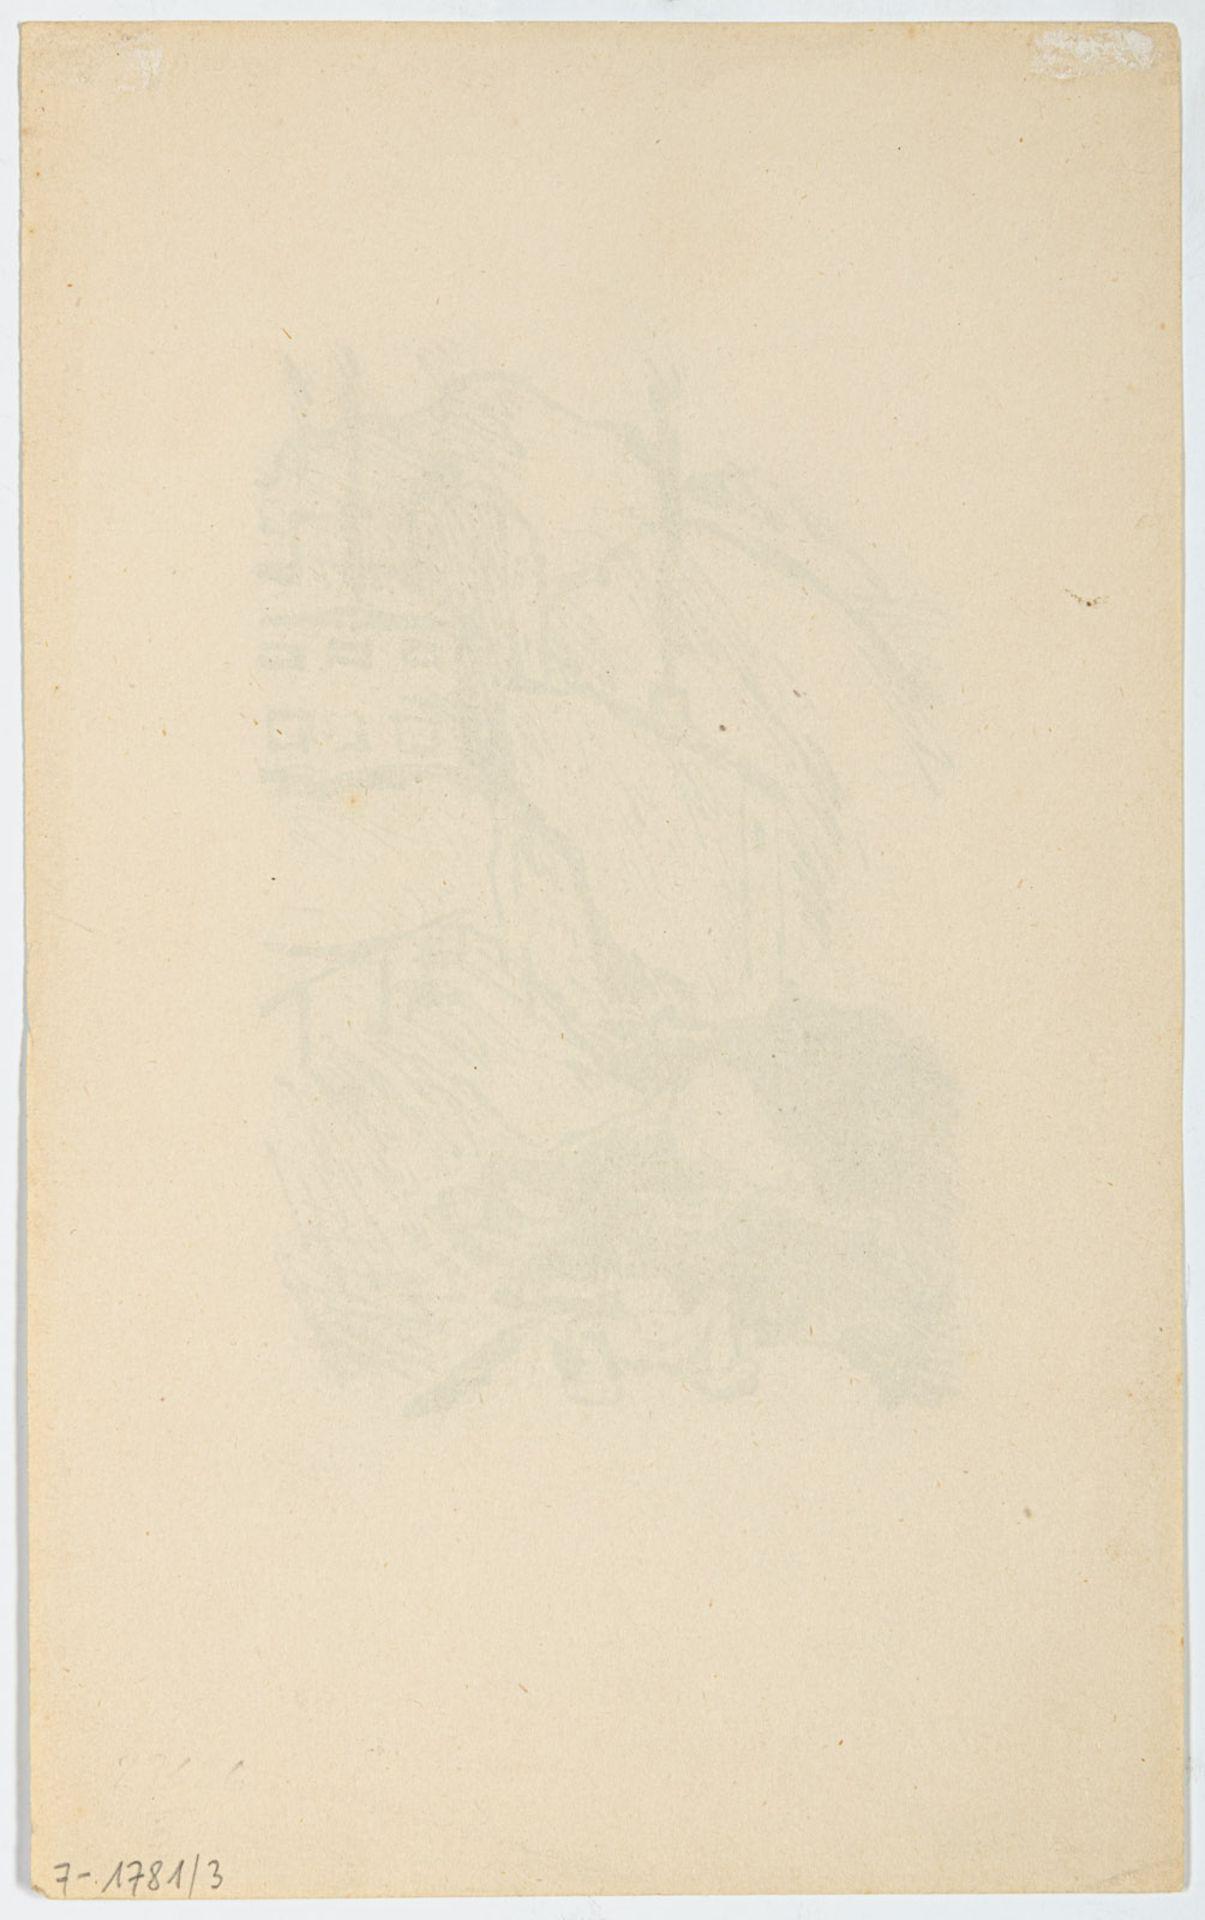 Beeh, René - Image 6 of 9